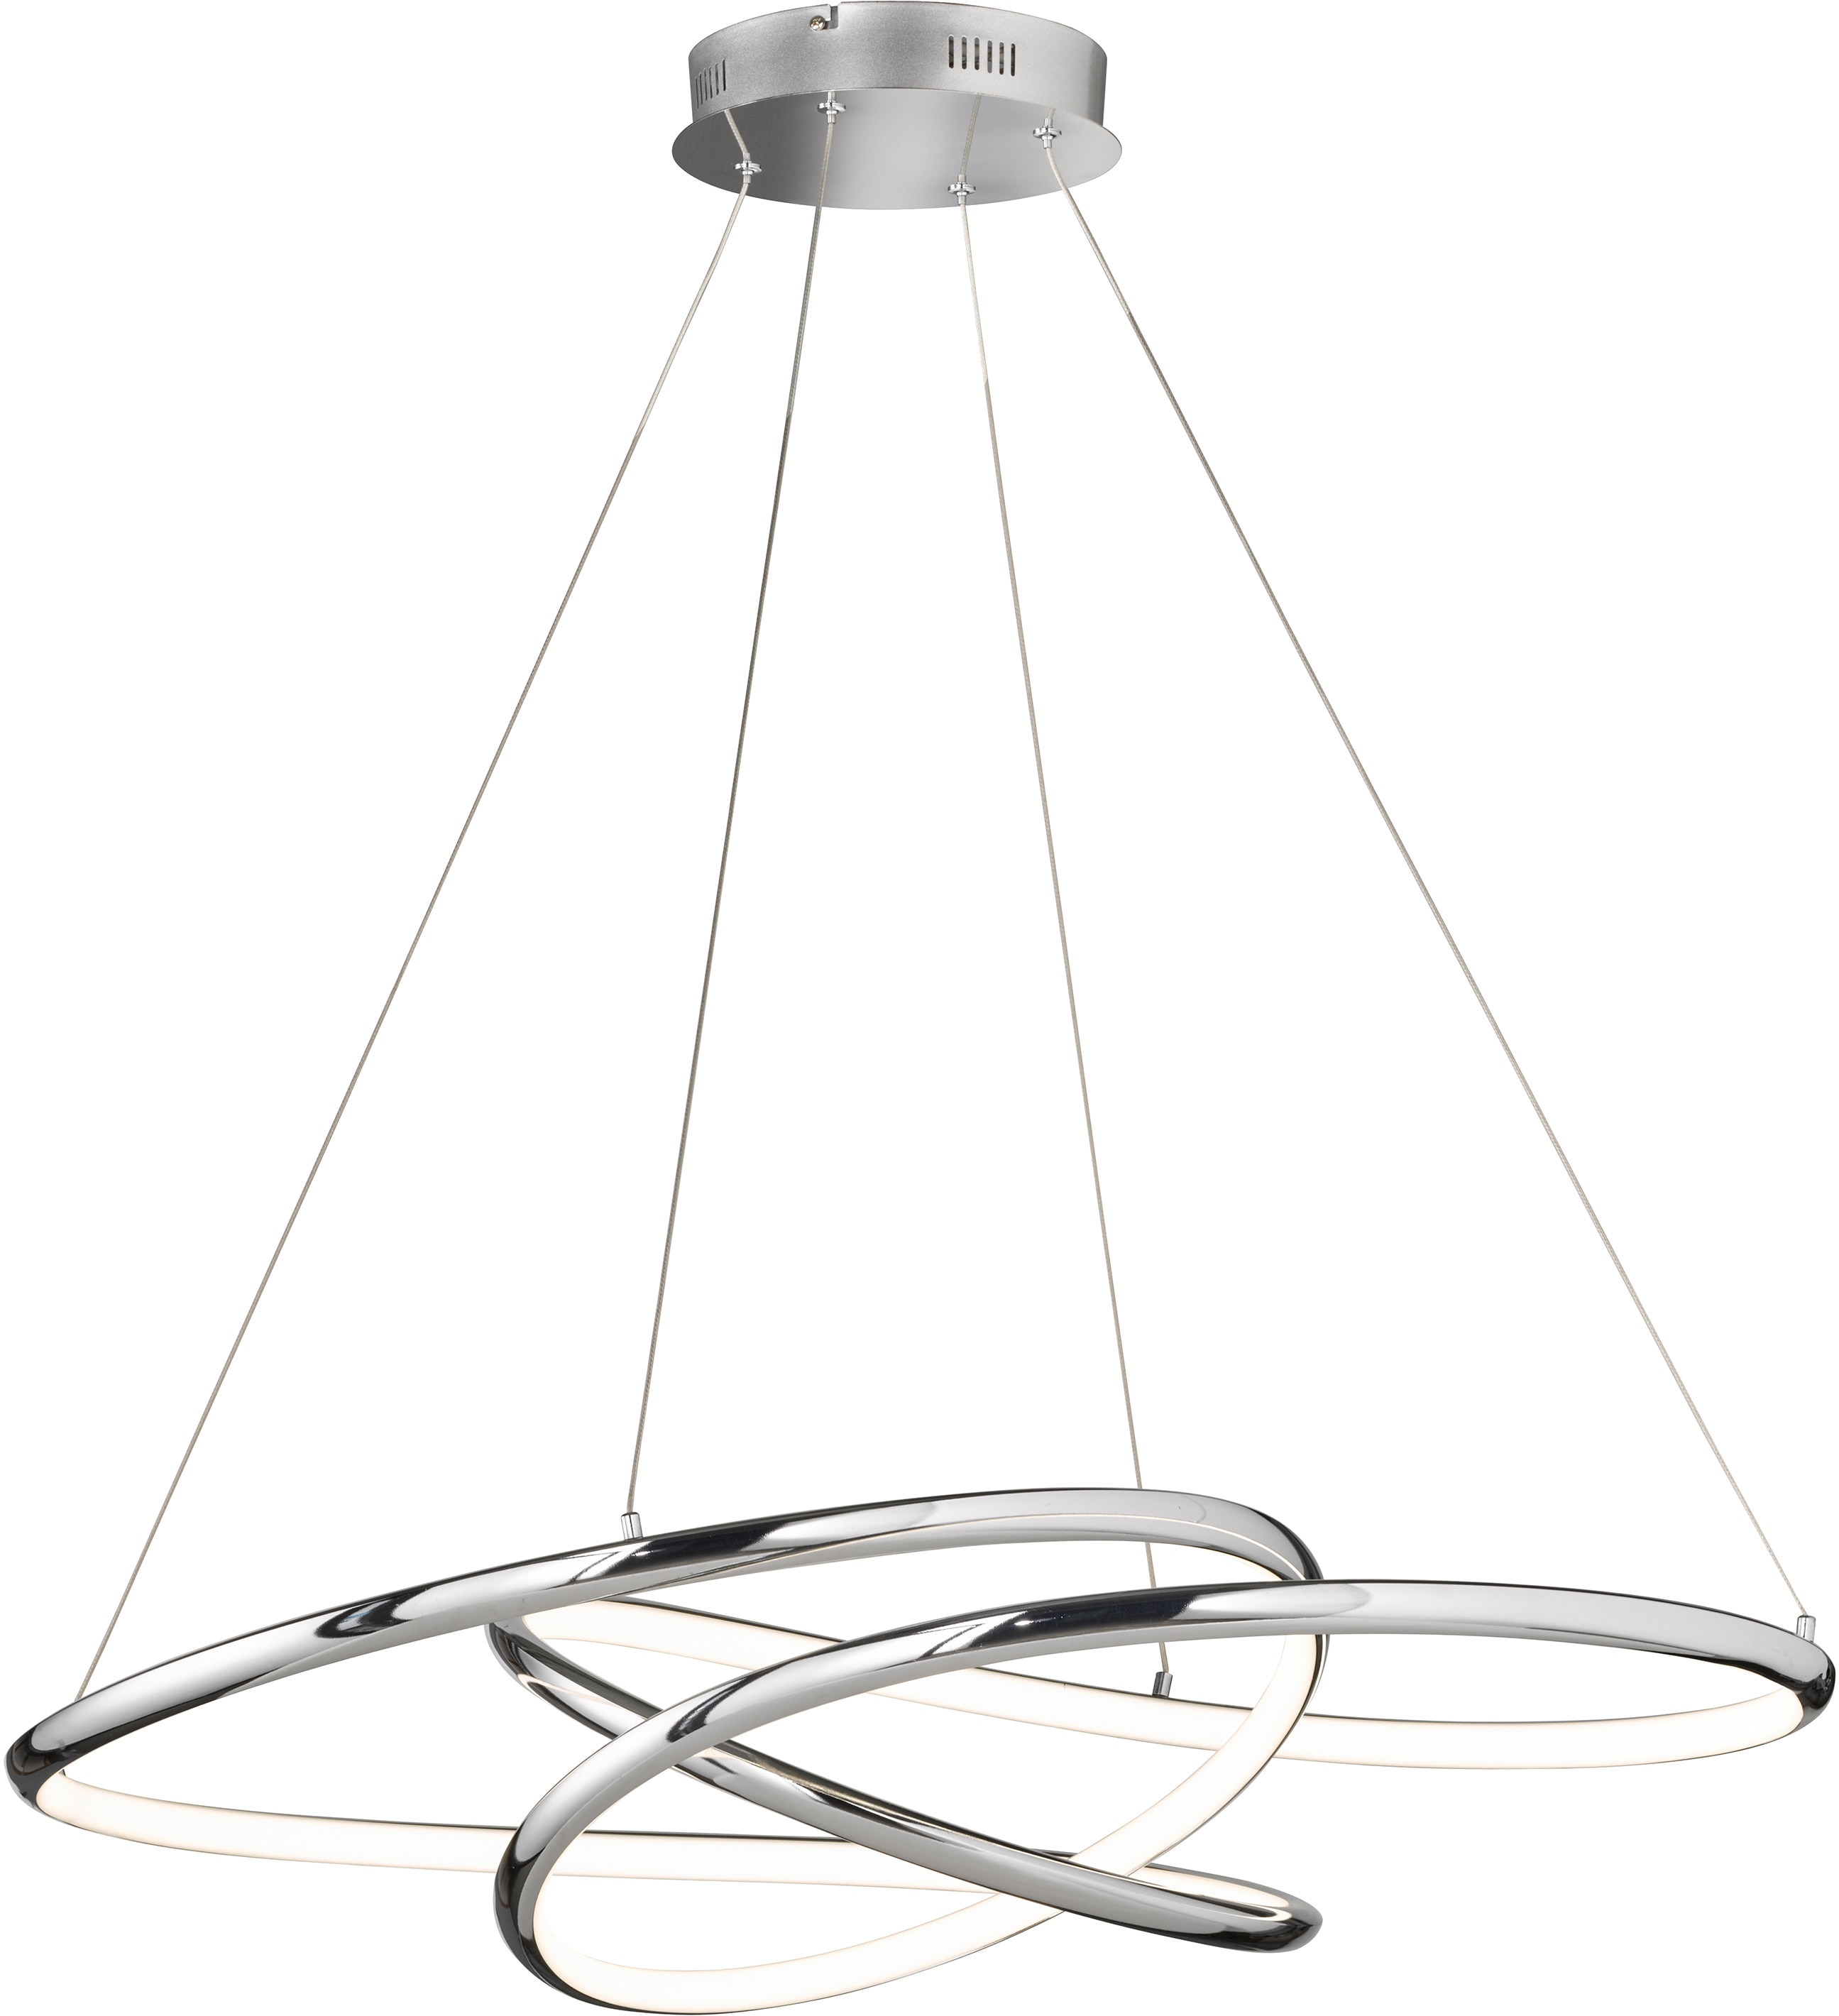 FISCHER & HONSEL LED Pendelleuchte Galaxy, LED-Board, 1 St., Warmweiß